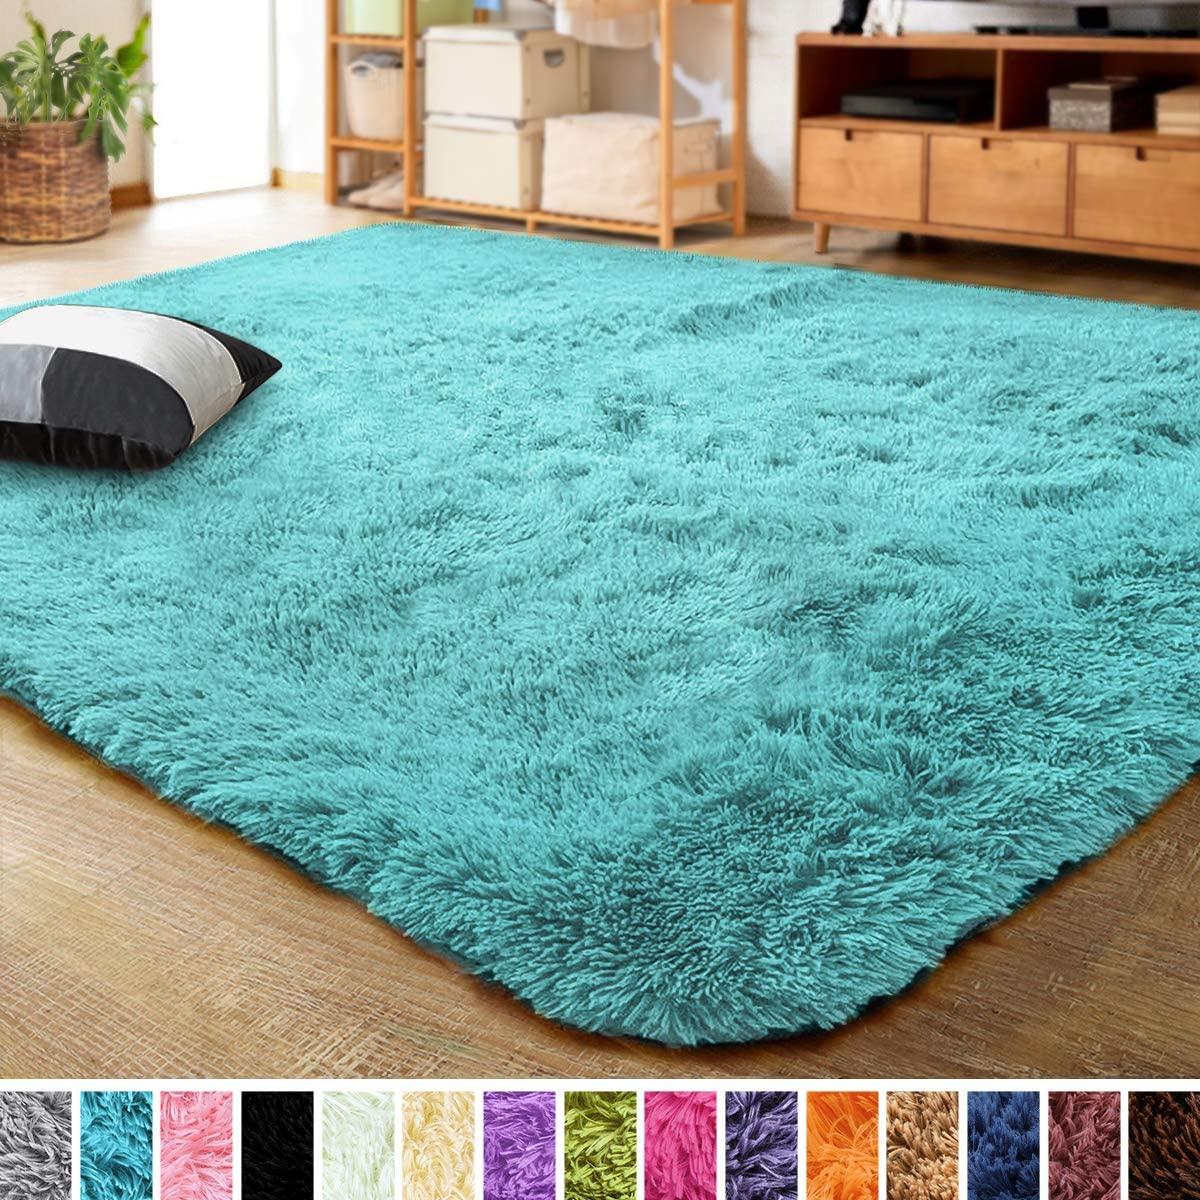 LOCHAS Ultra Soft Indoor Modern Area Rugs Fluffy Living Room Carpets for Children Bedroom Home Decor Nursery Rug 3x5 Feet, Blue